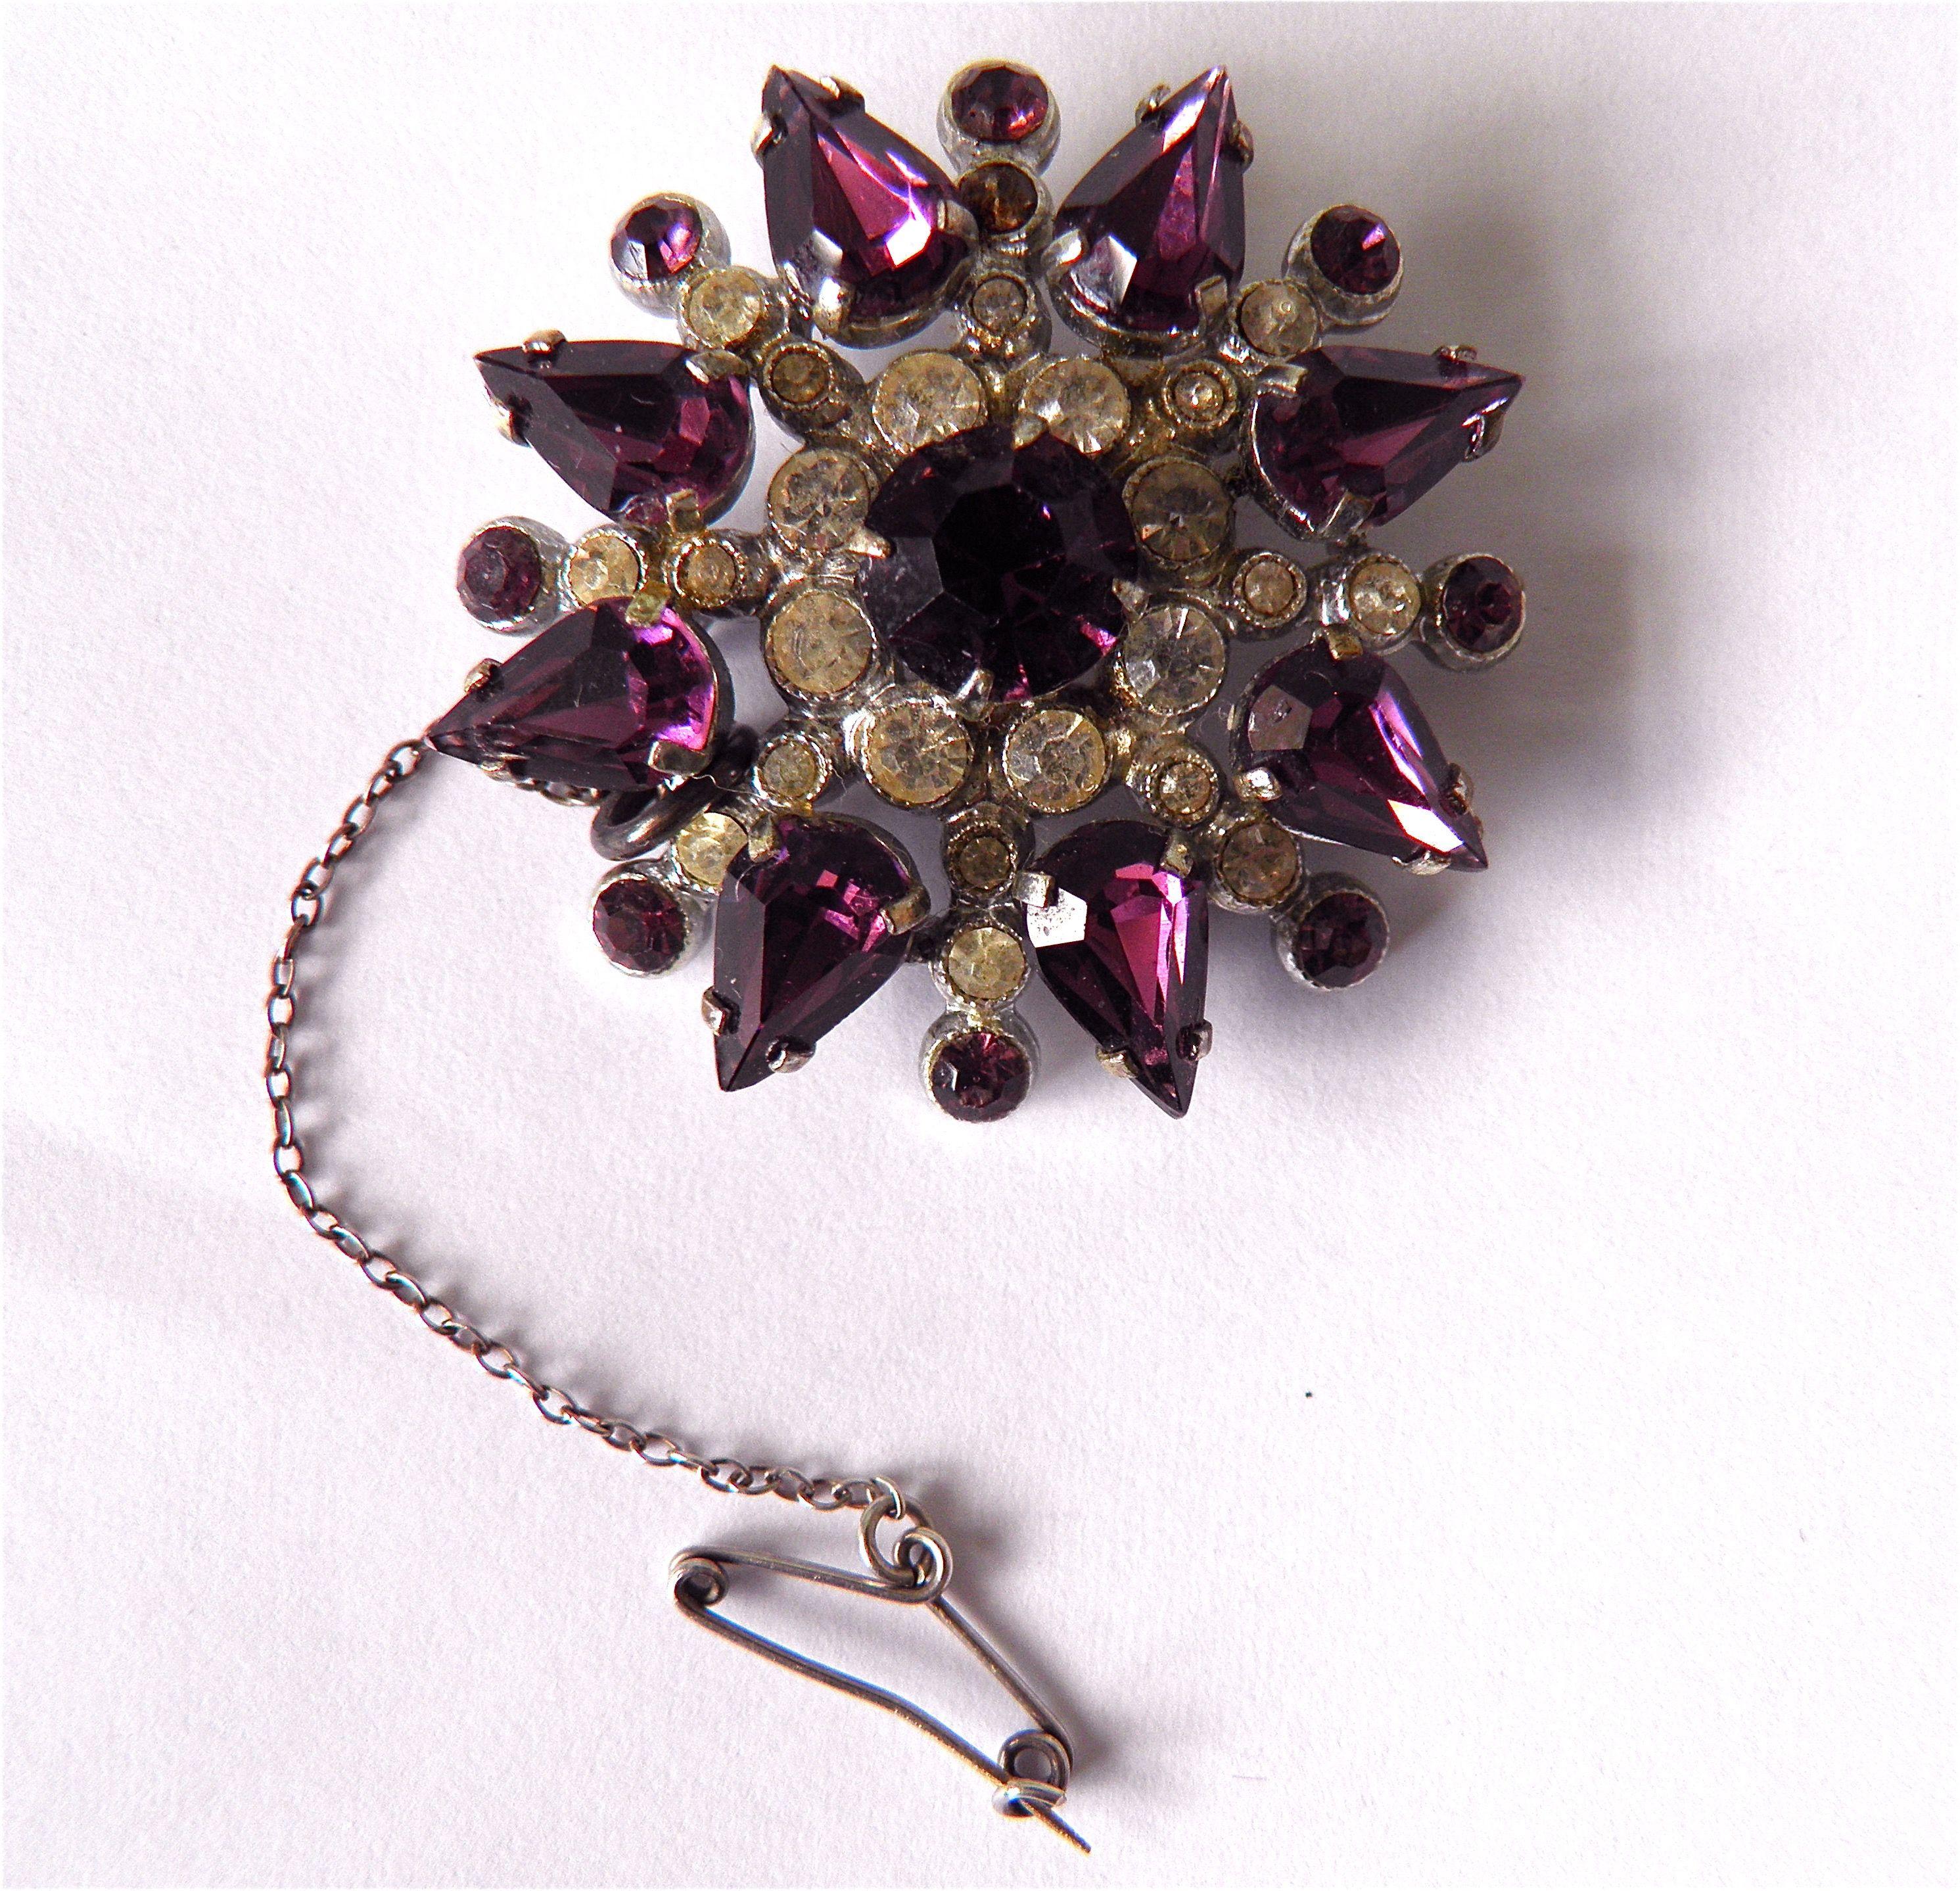 Vintage Gilt Silver Diamante Amethyst Glass Paste Brooch Pin Broach Pear Chaton 05.51